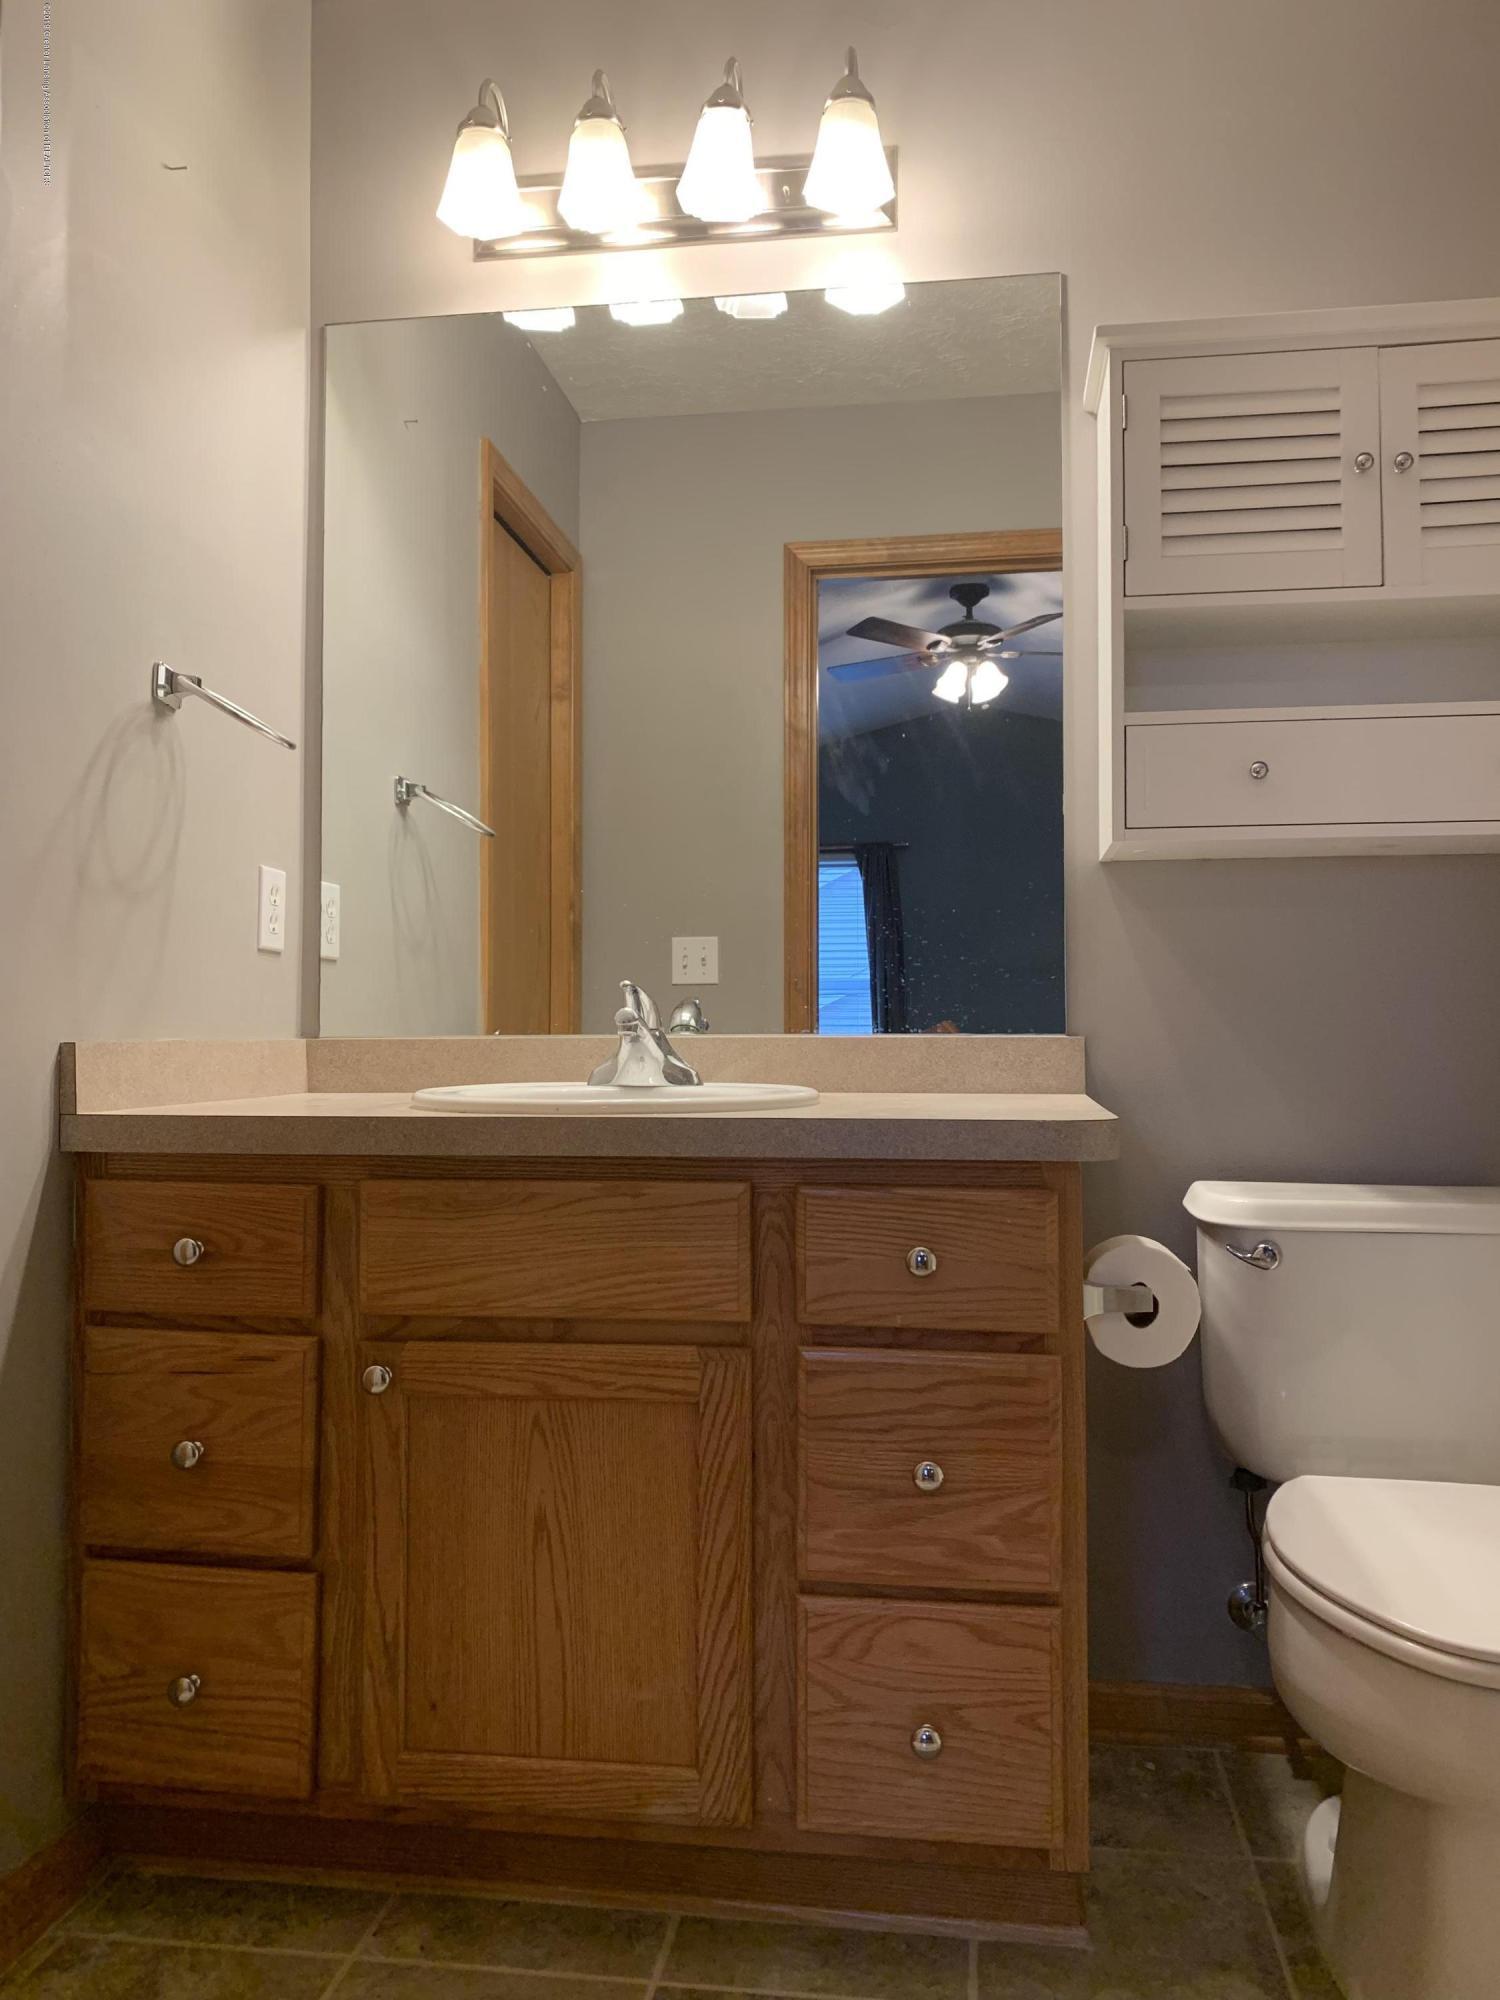 14705 Hardtke Dr - Bathroom - 43